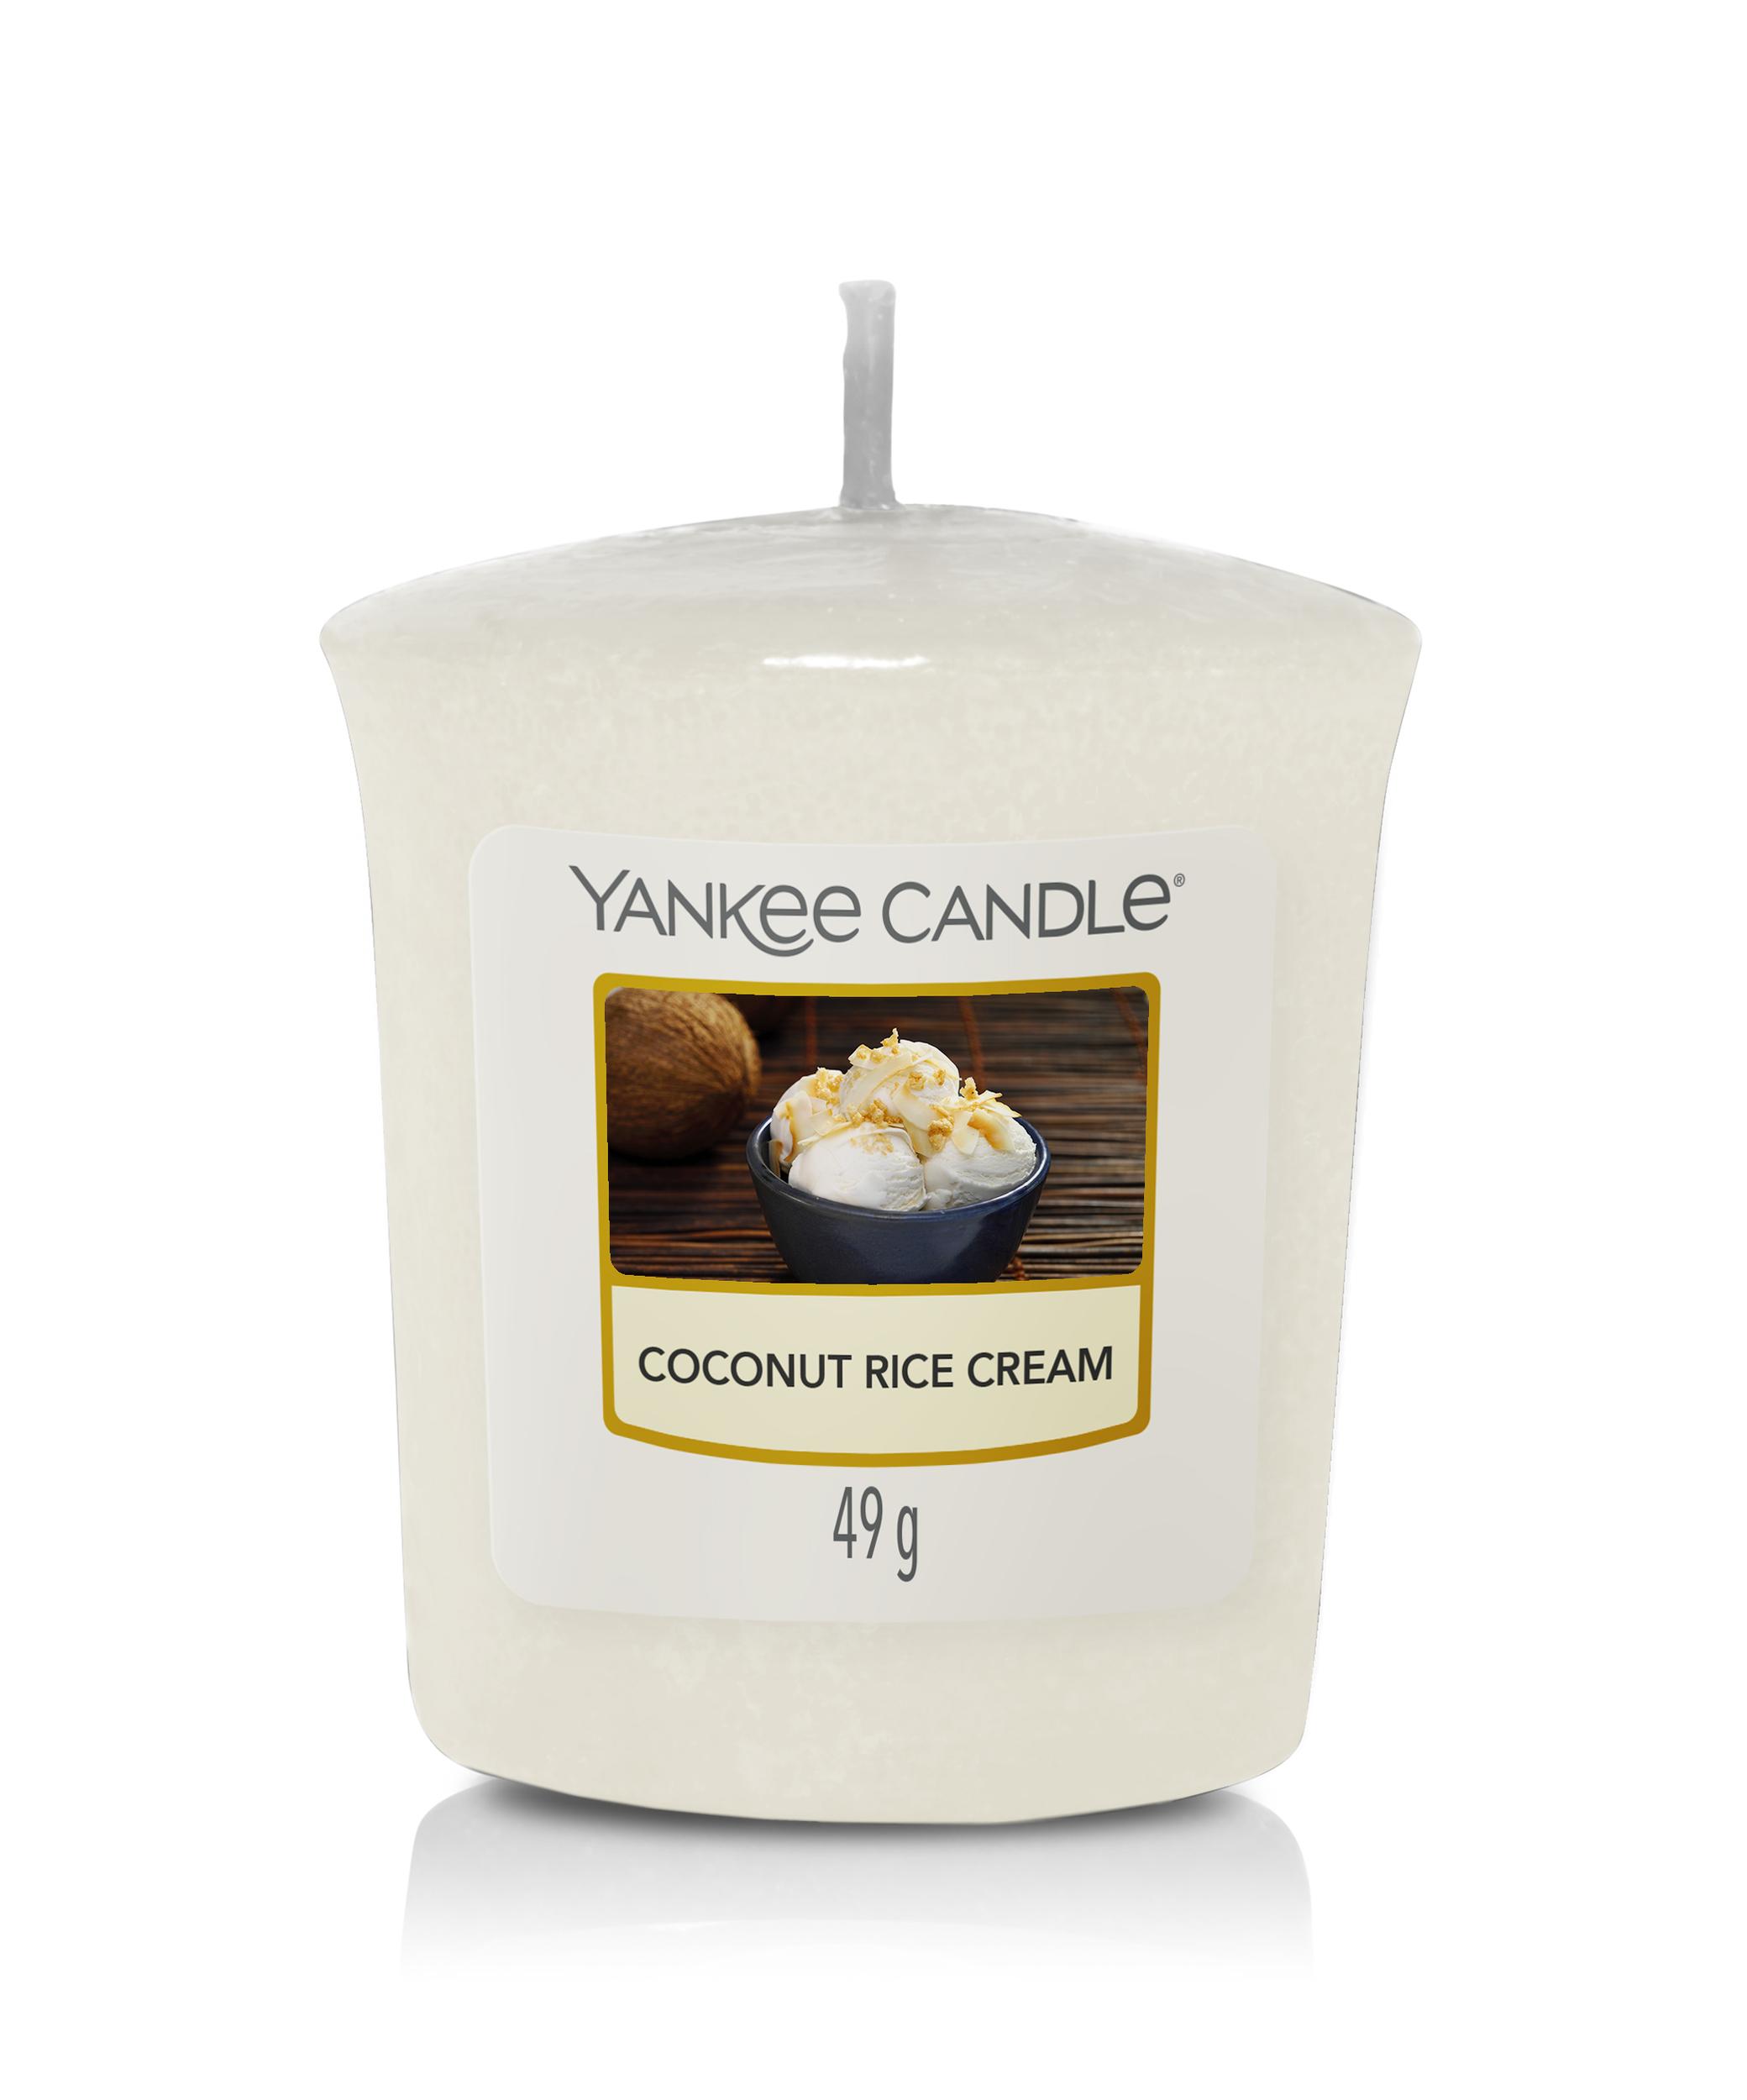 Bougie Coconut Rice Cream votive - Yankee Candle